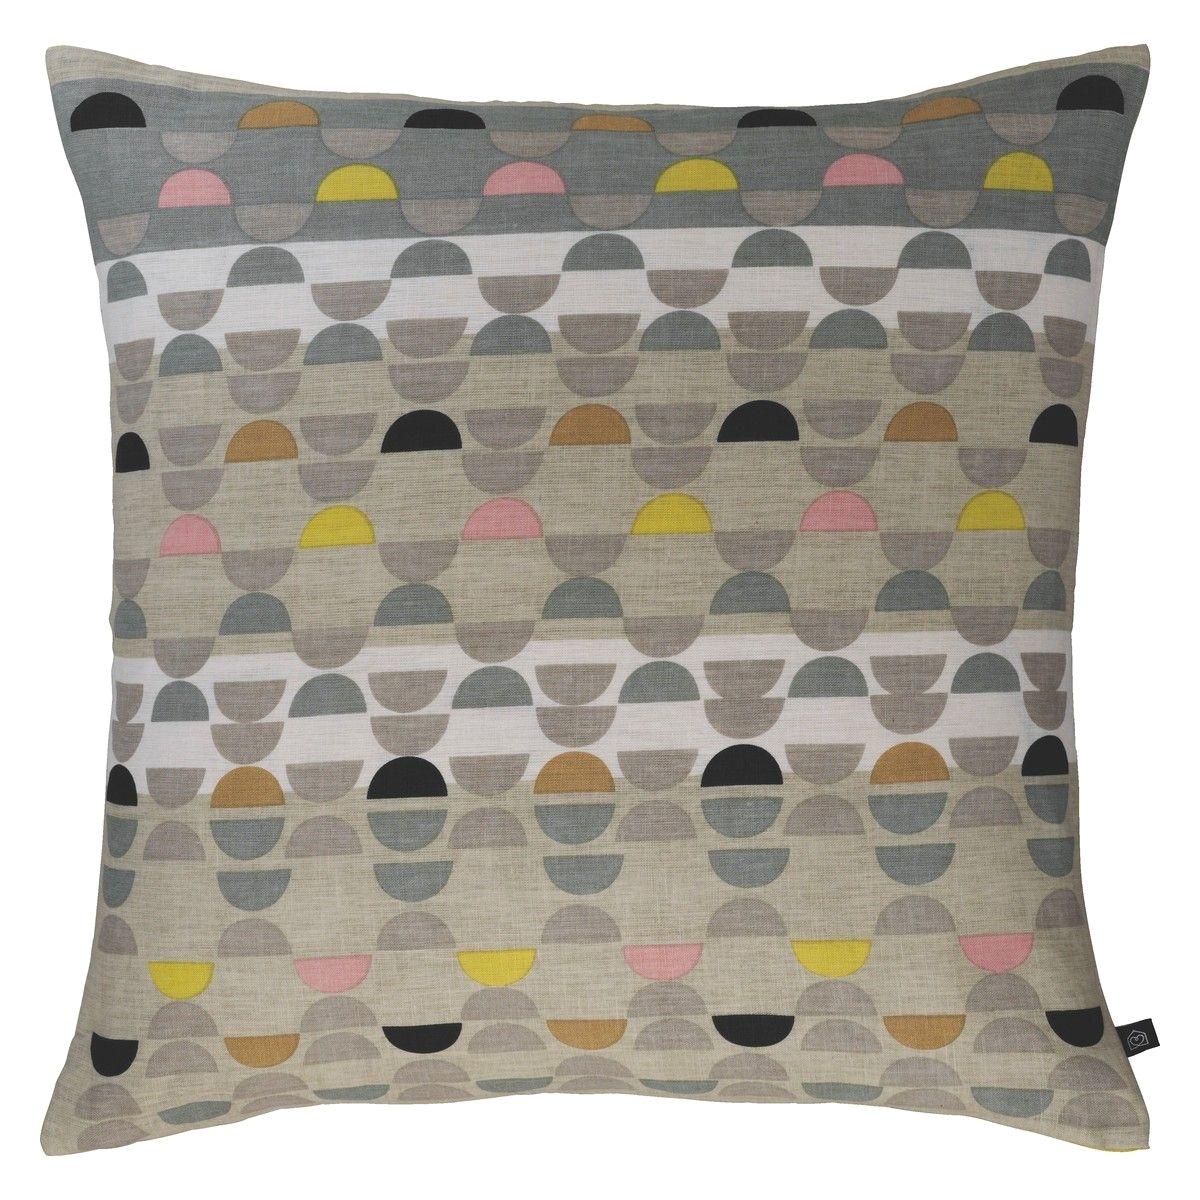 Velvet Floor Cushions Uk Odeon Multi Coloured Patterned Cushion 60 X 60cm Buy now at